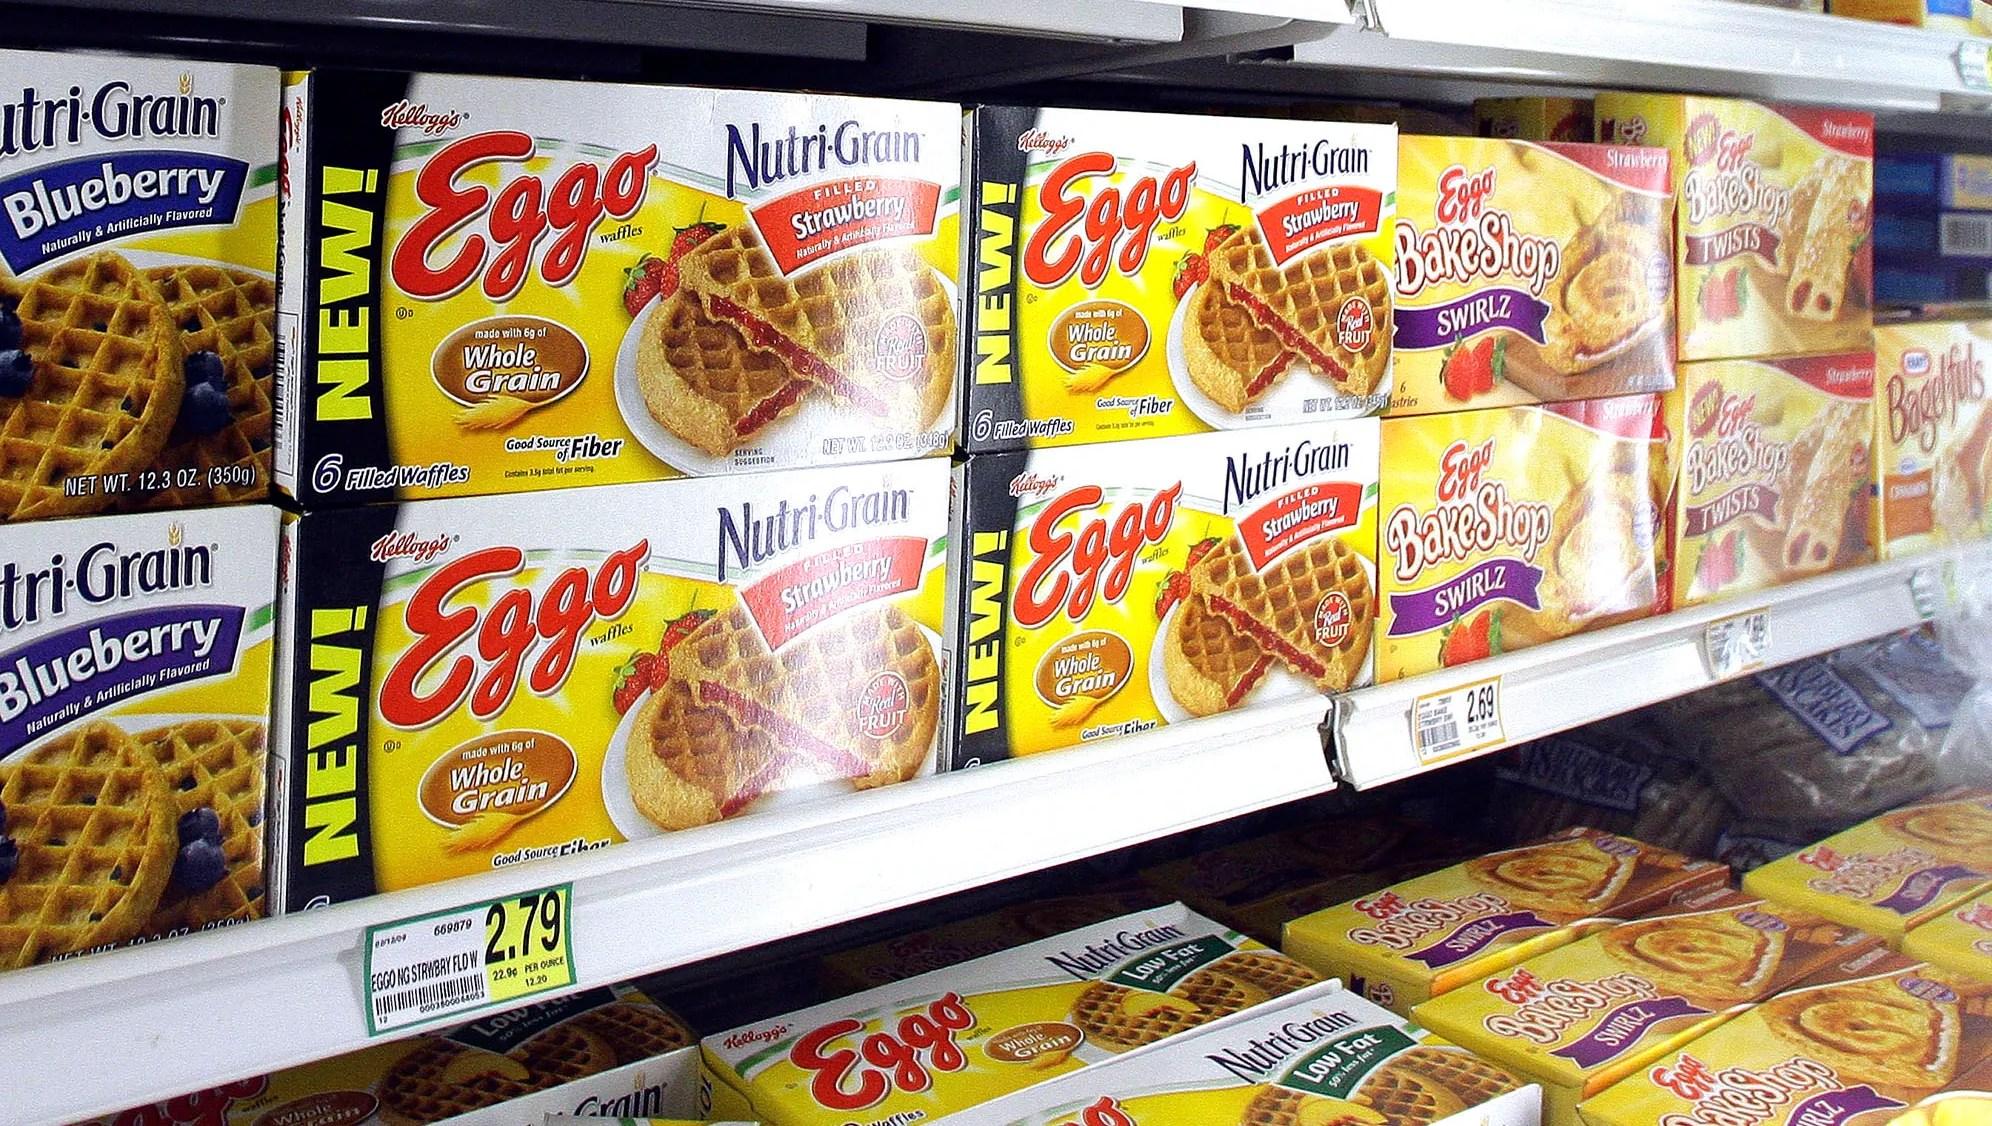 Fullsize Of Eggo Waffle Recall 2016